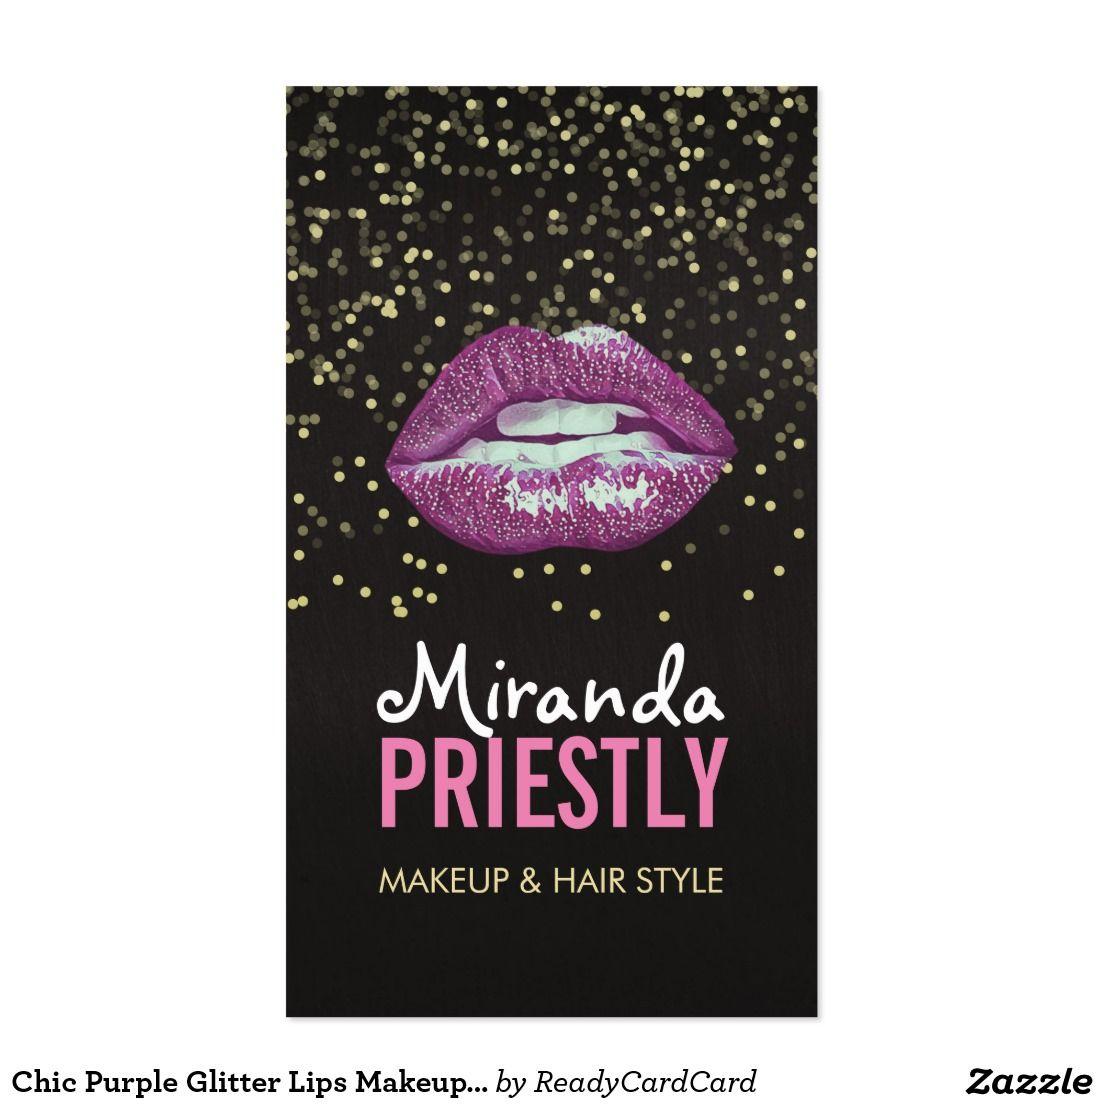 Chic Purple Glitter Lips Makeup Artist Appointment Glitter Lips